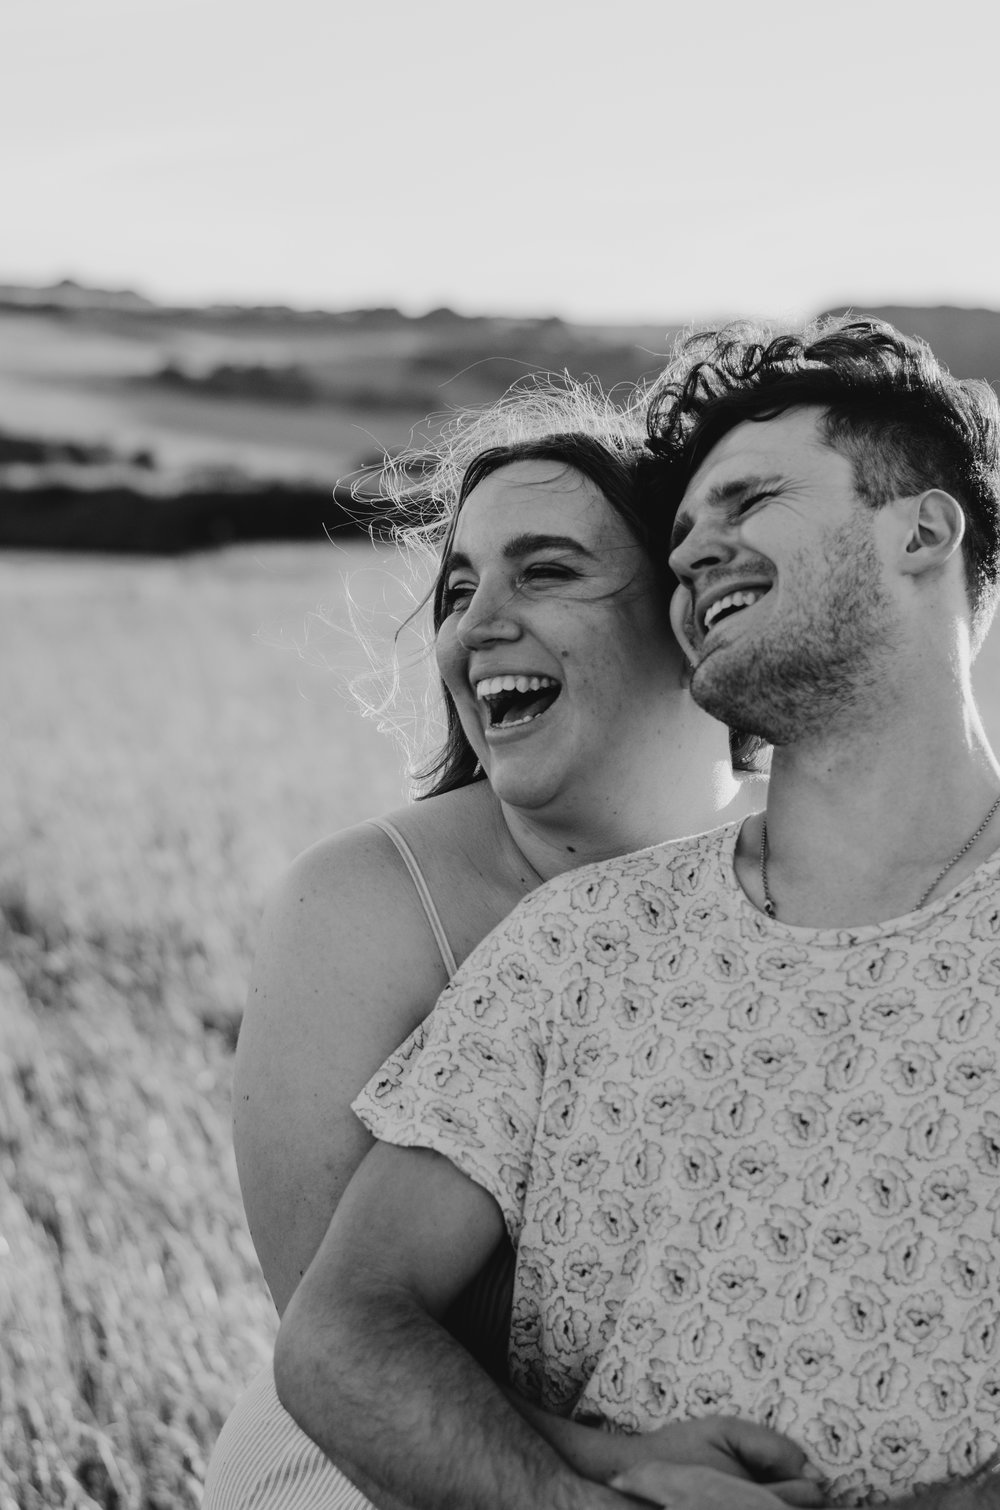 Rebecca & Dougie - Cuckmere Haven - Couple Session - Aiste Saulyte Photography-11.jpg